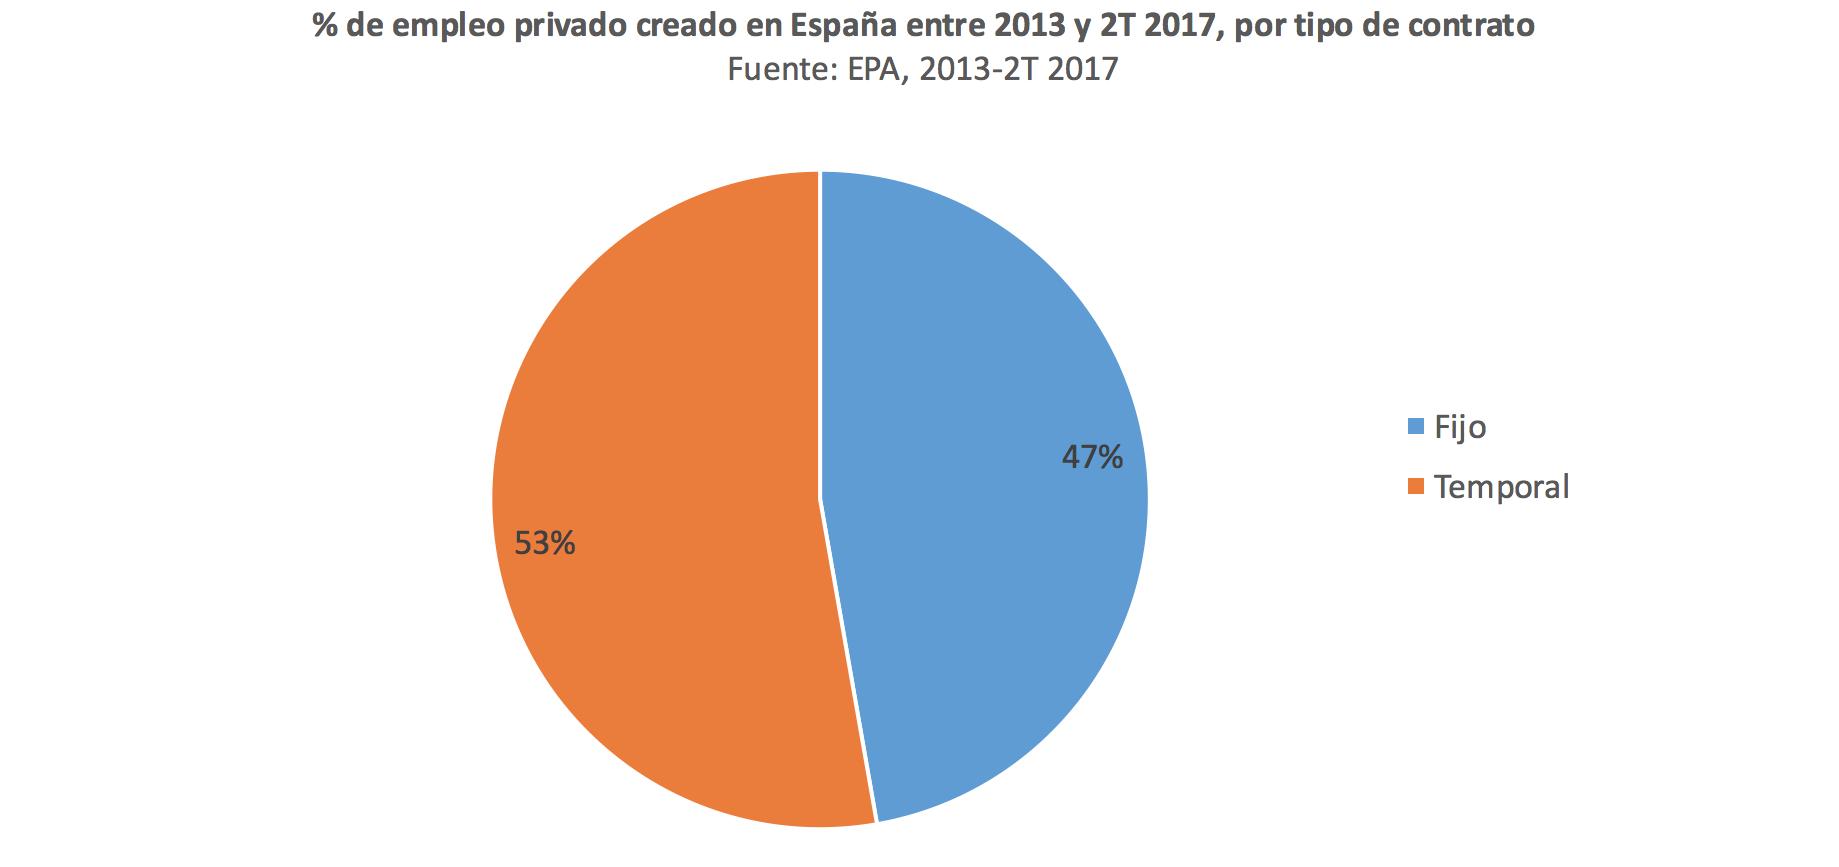 2-Empleo-fijo-temporal-Espana.png